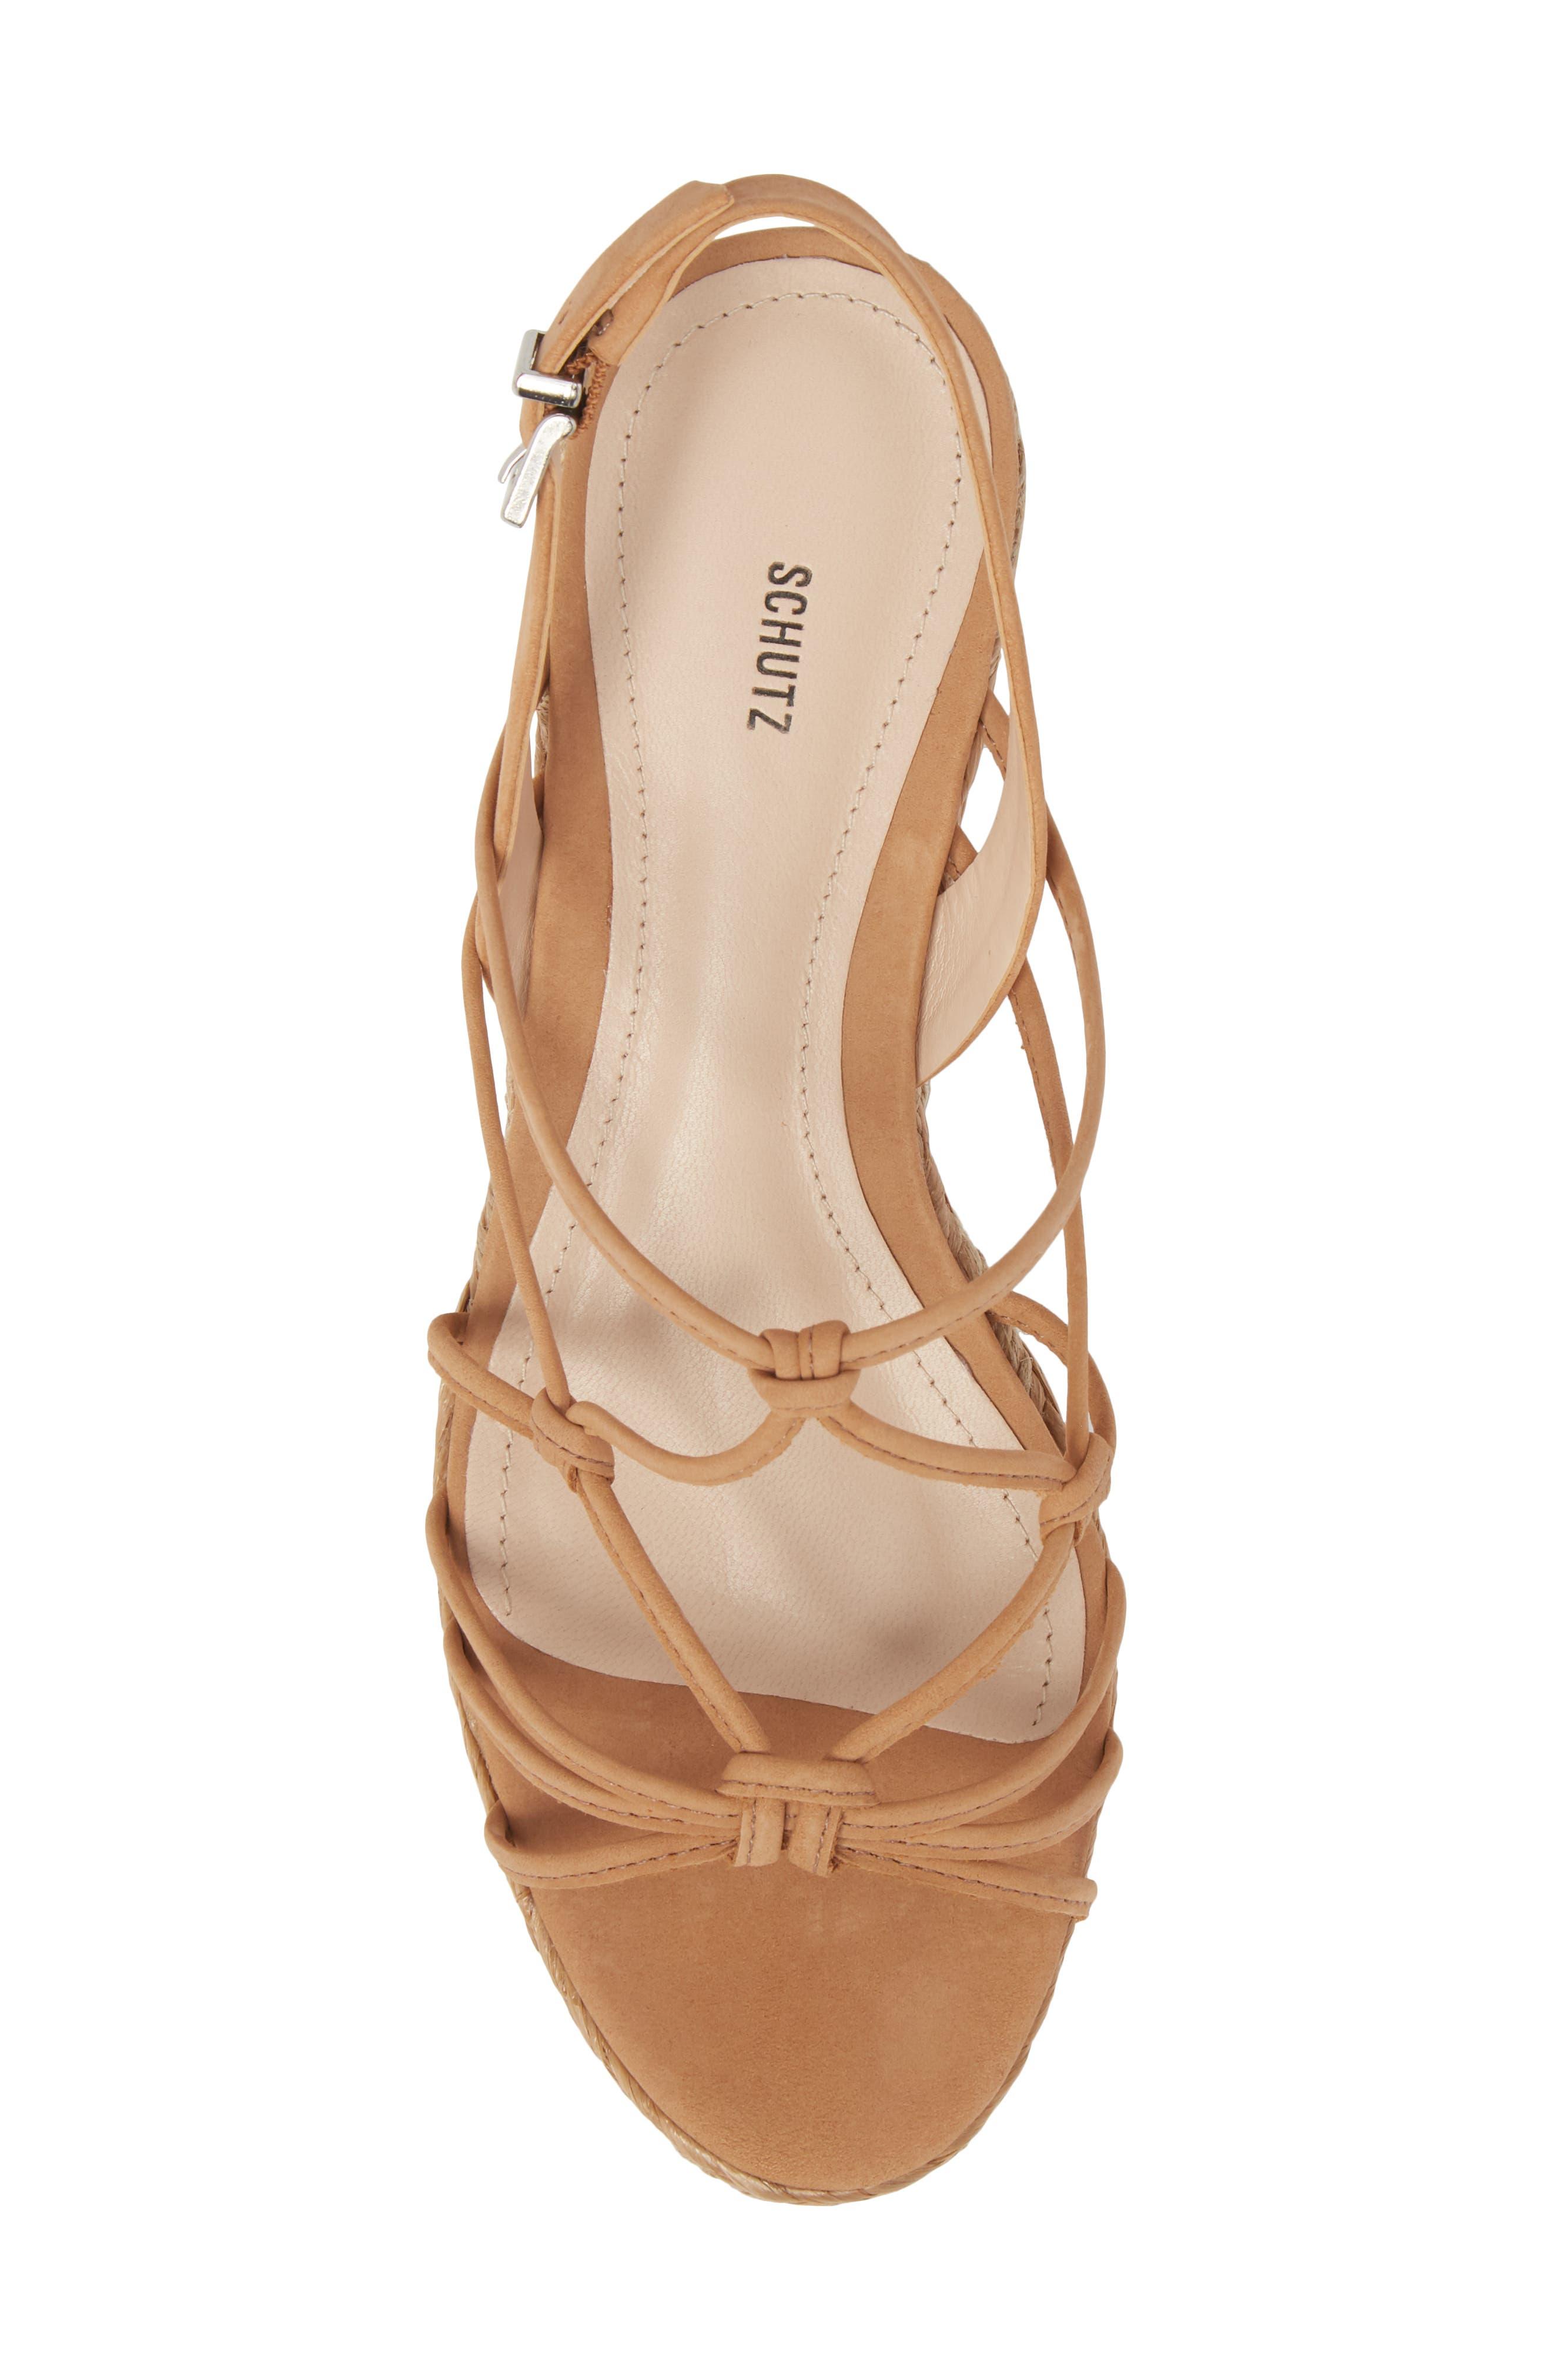 Latussa Platform Espadrille Sandal,                             Alternate thumbnail 5, color,                             Desert Leather